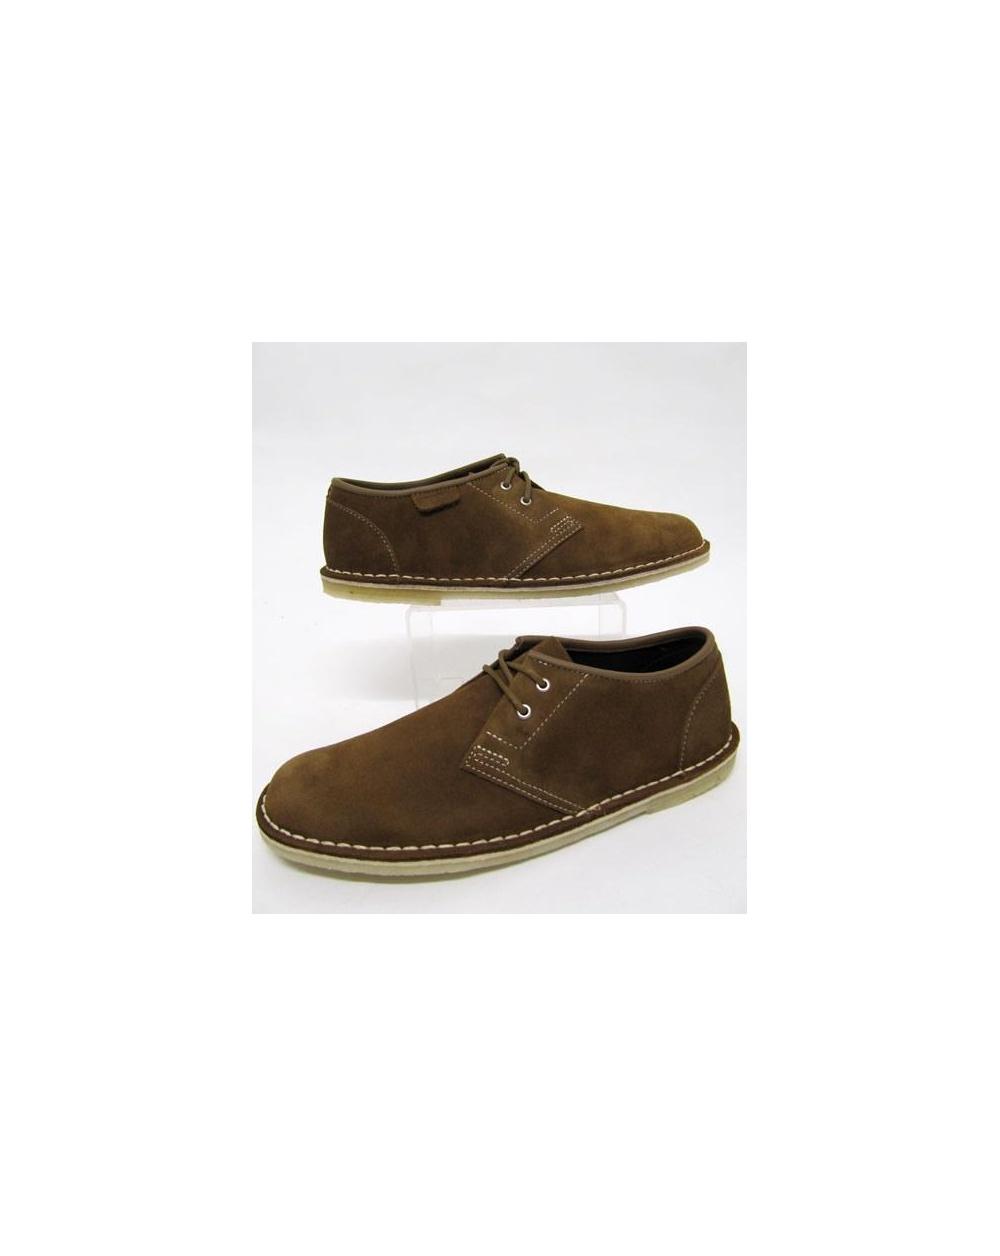 Clarks Originals Jink Shoe In Suede Cola